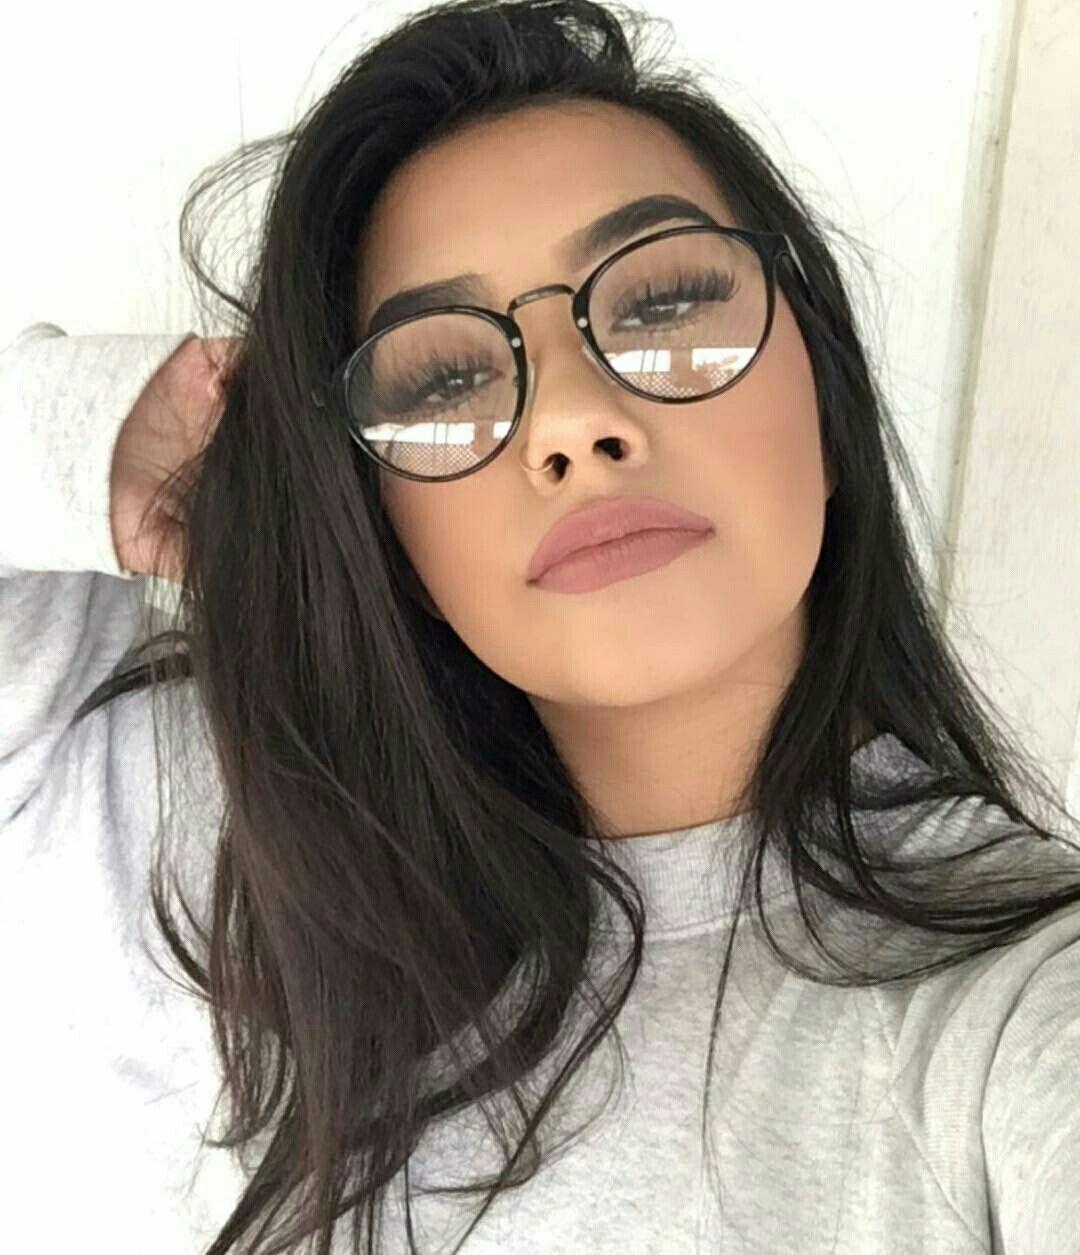 P I N T E R E S T Goyagal Accessories Acessorios Oculos